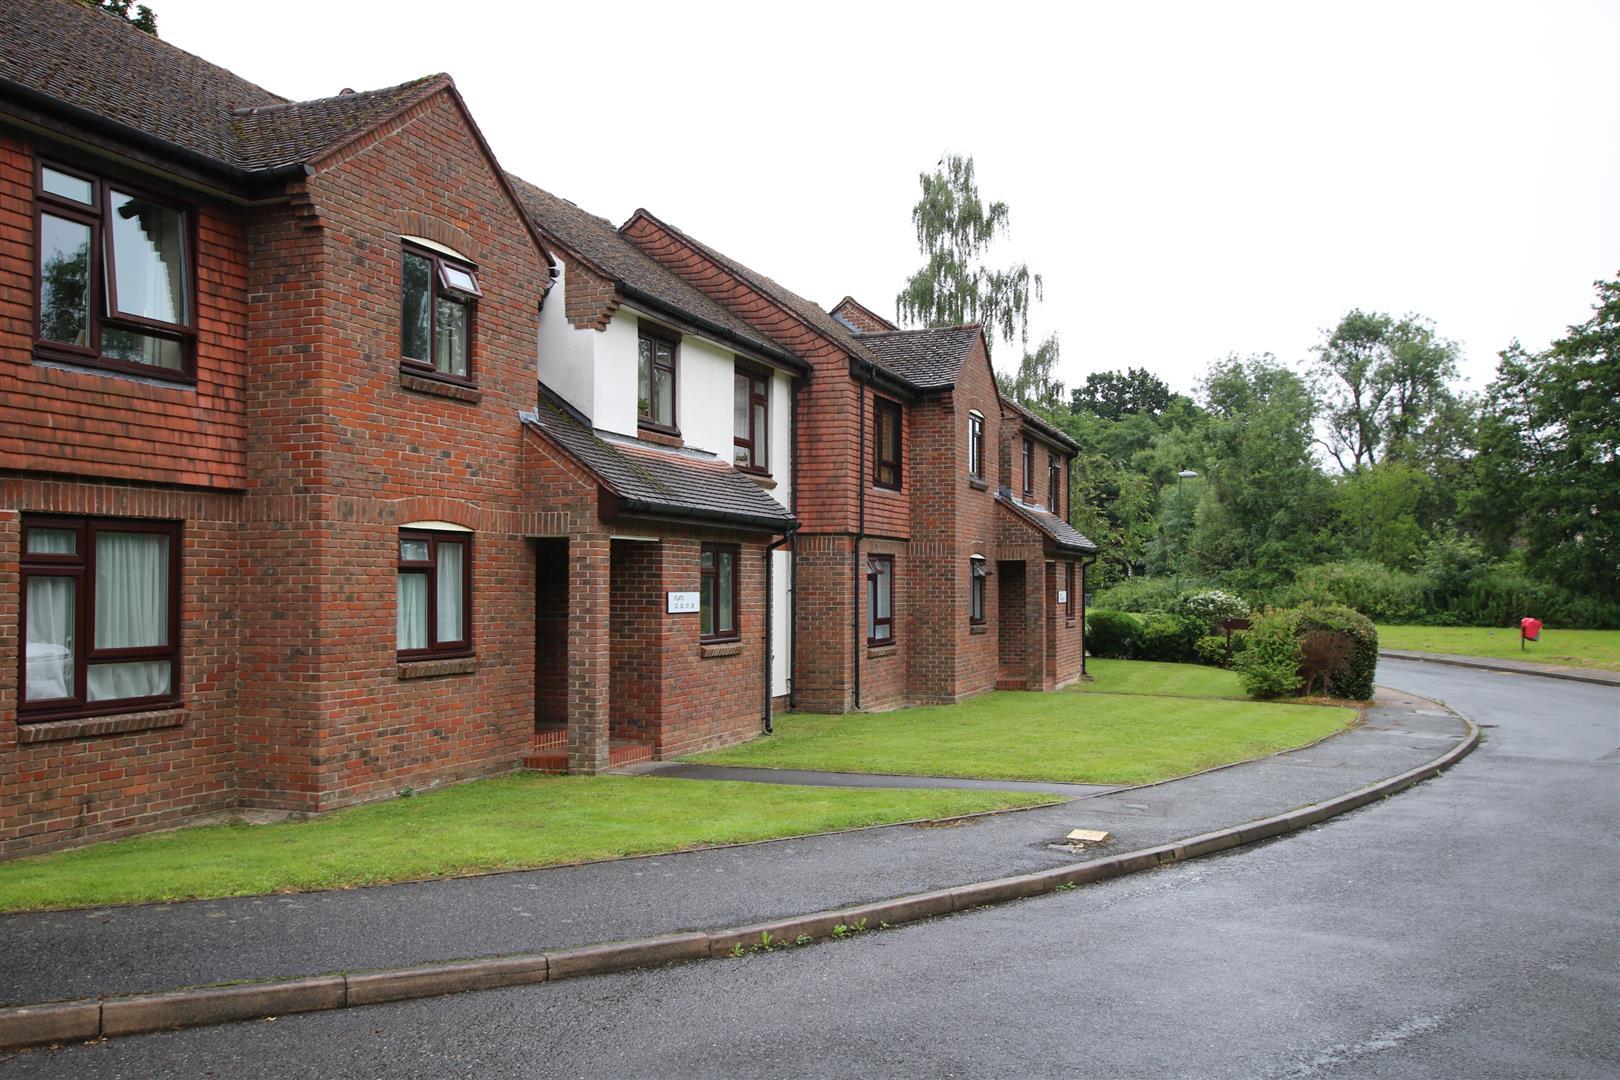 Gorringes Brook, Horsham